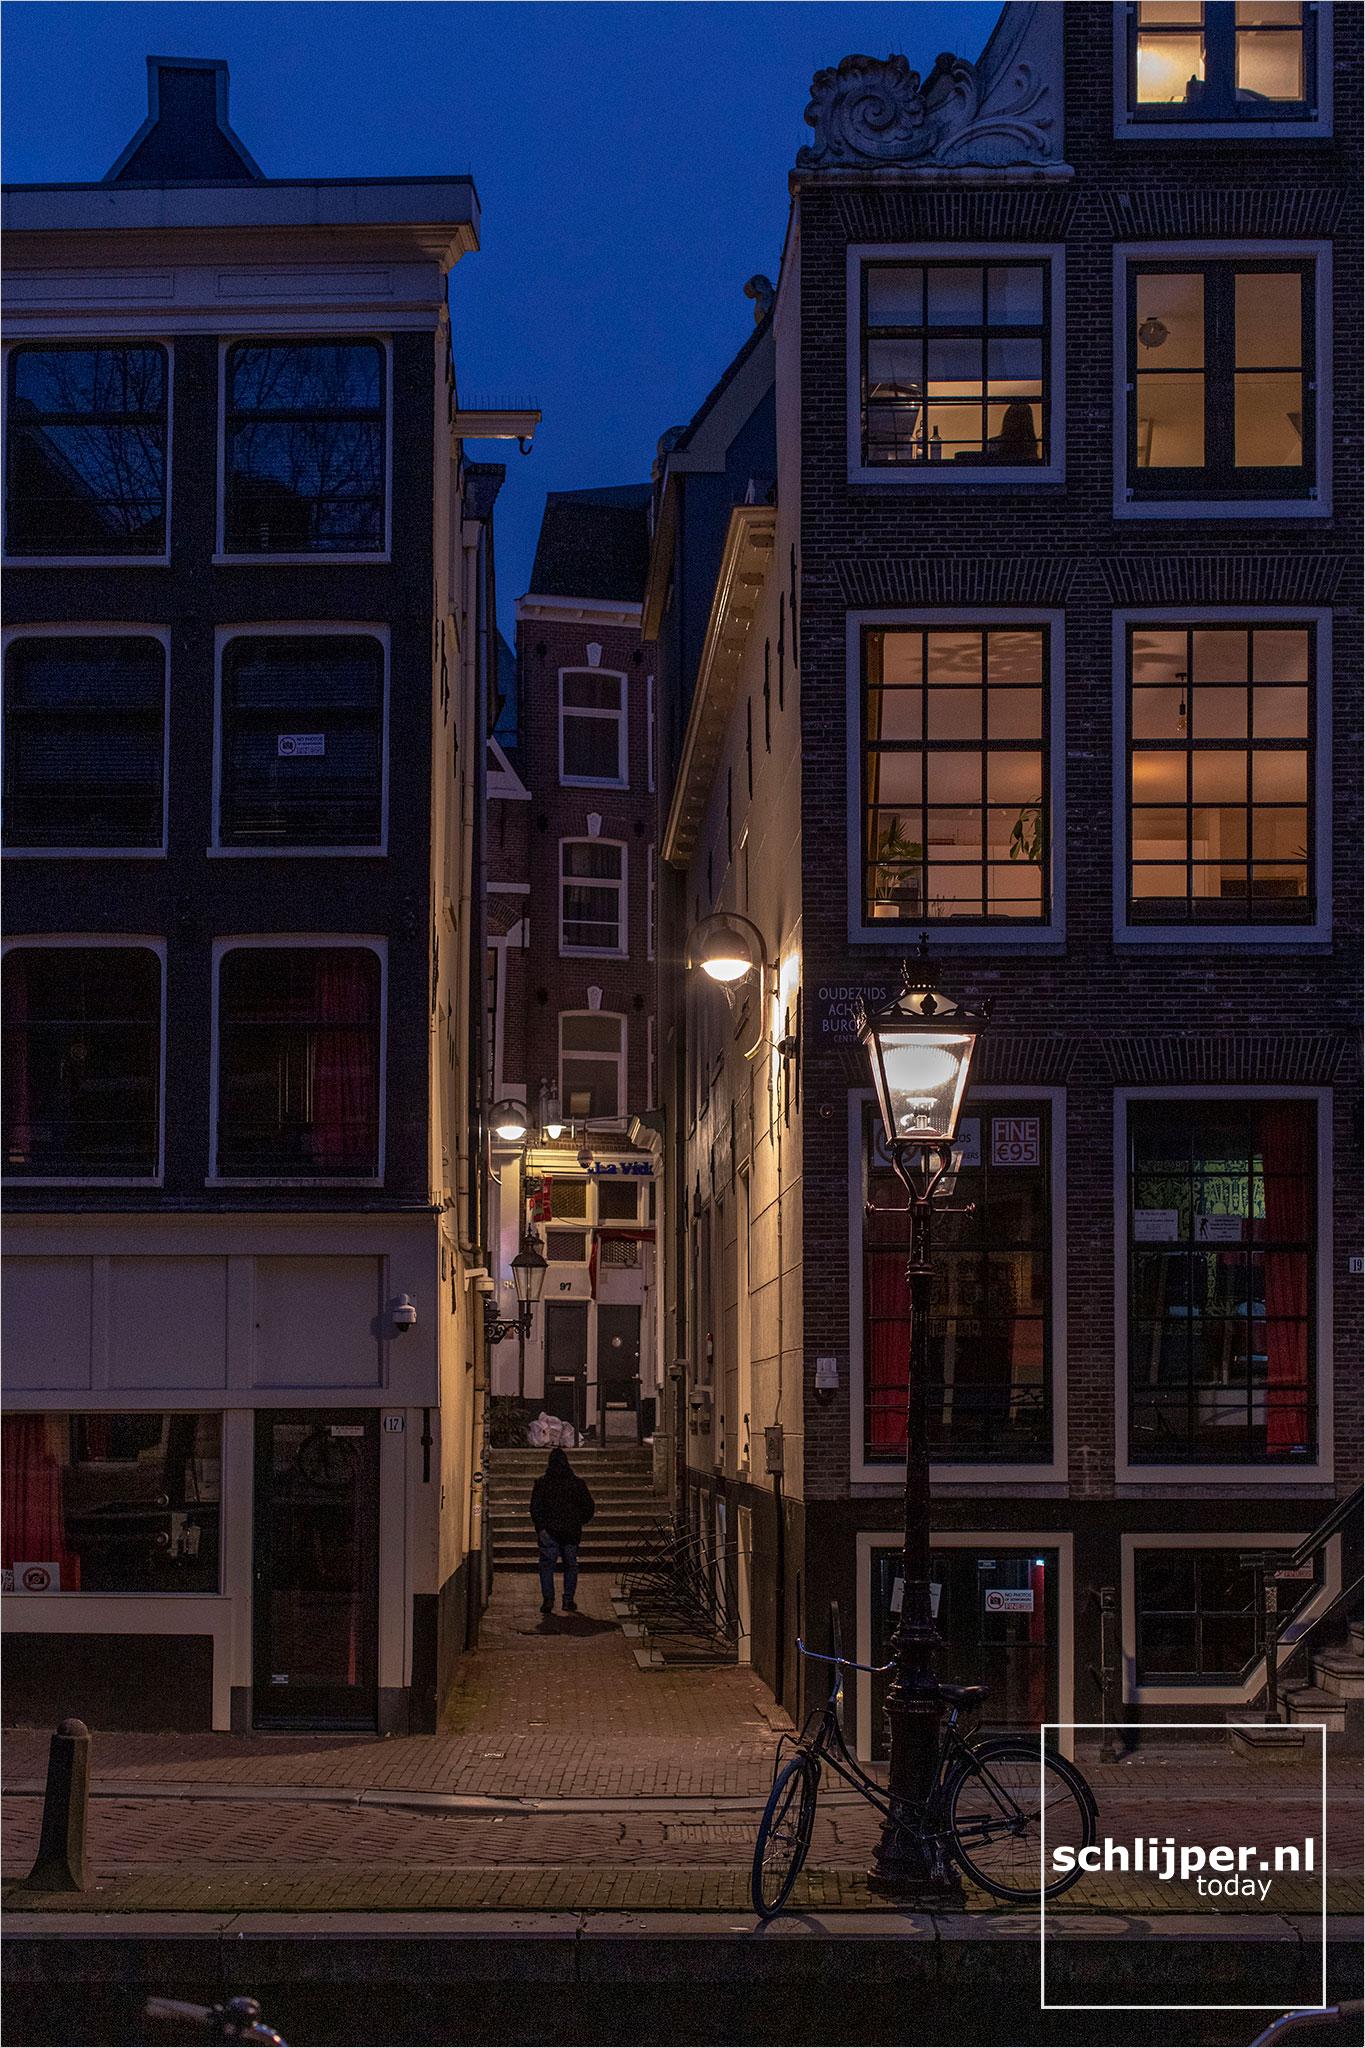 The Netherlands, Amsterdam, 11 januari 2021